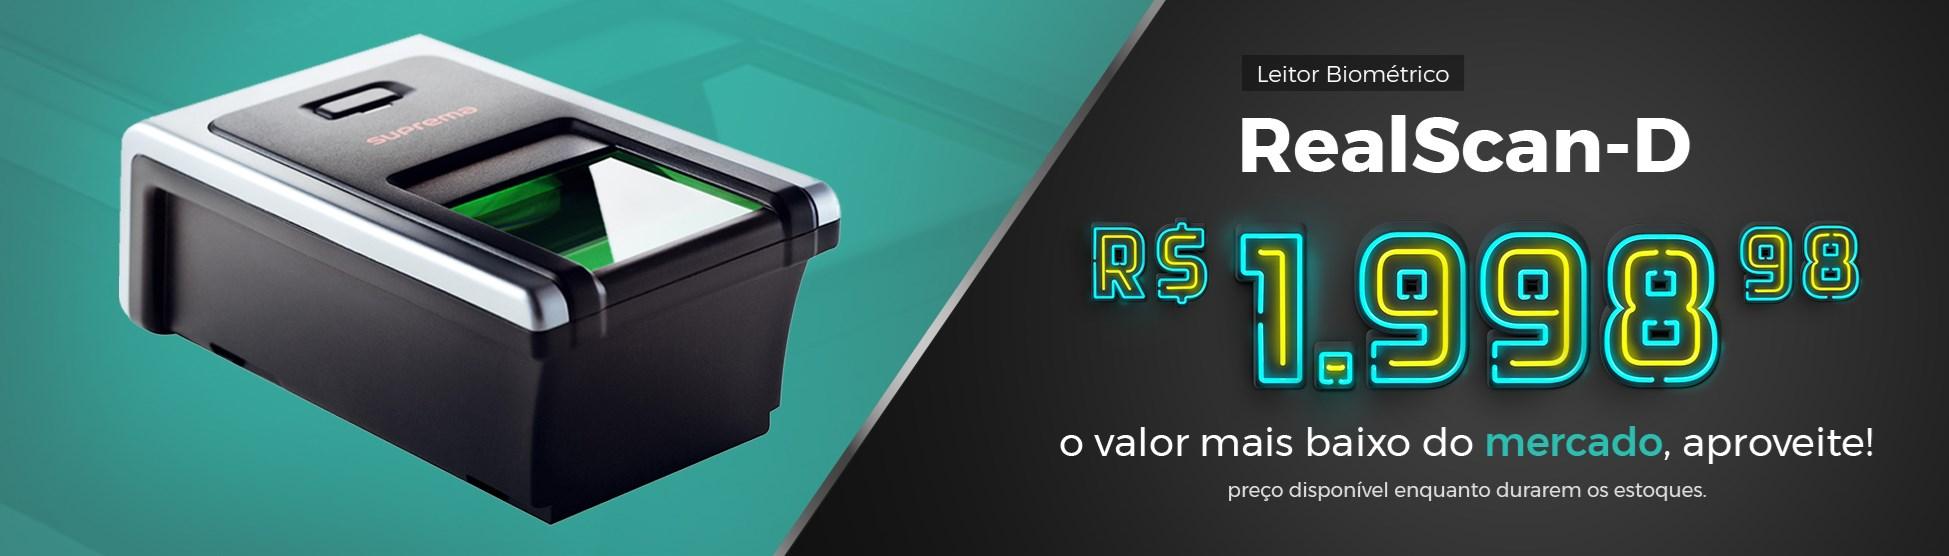 RealScan-D